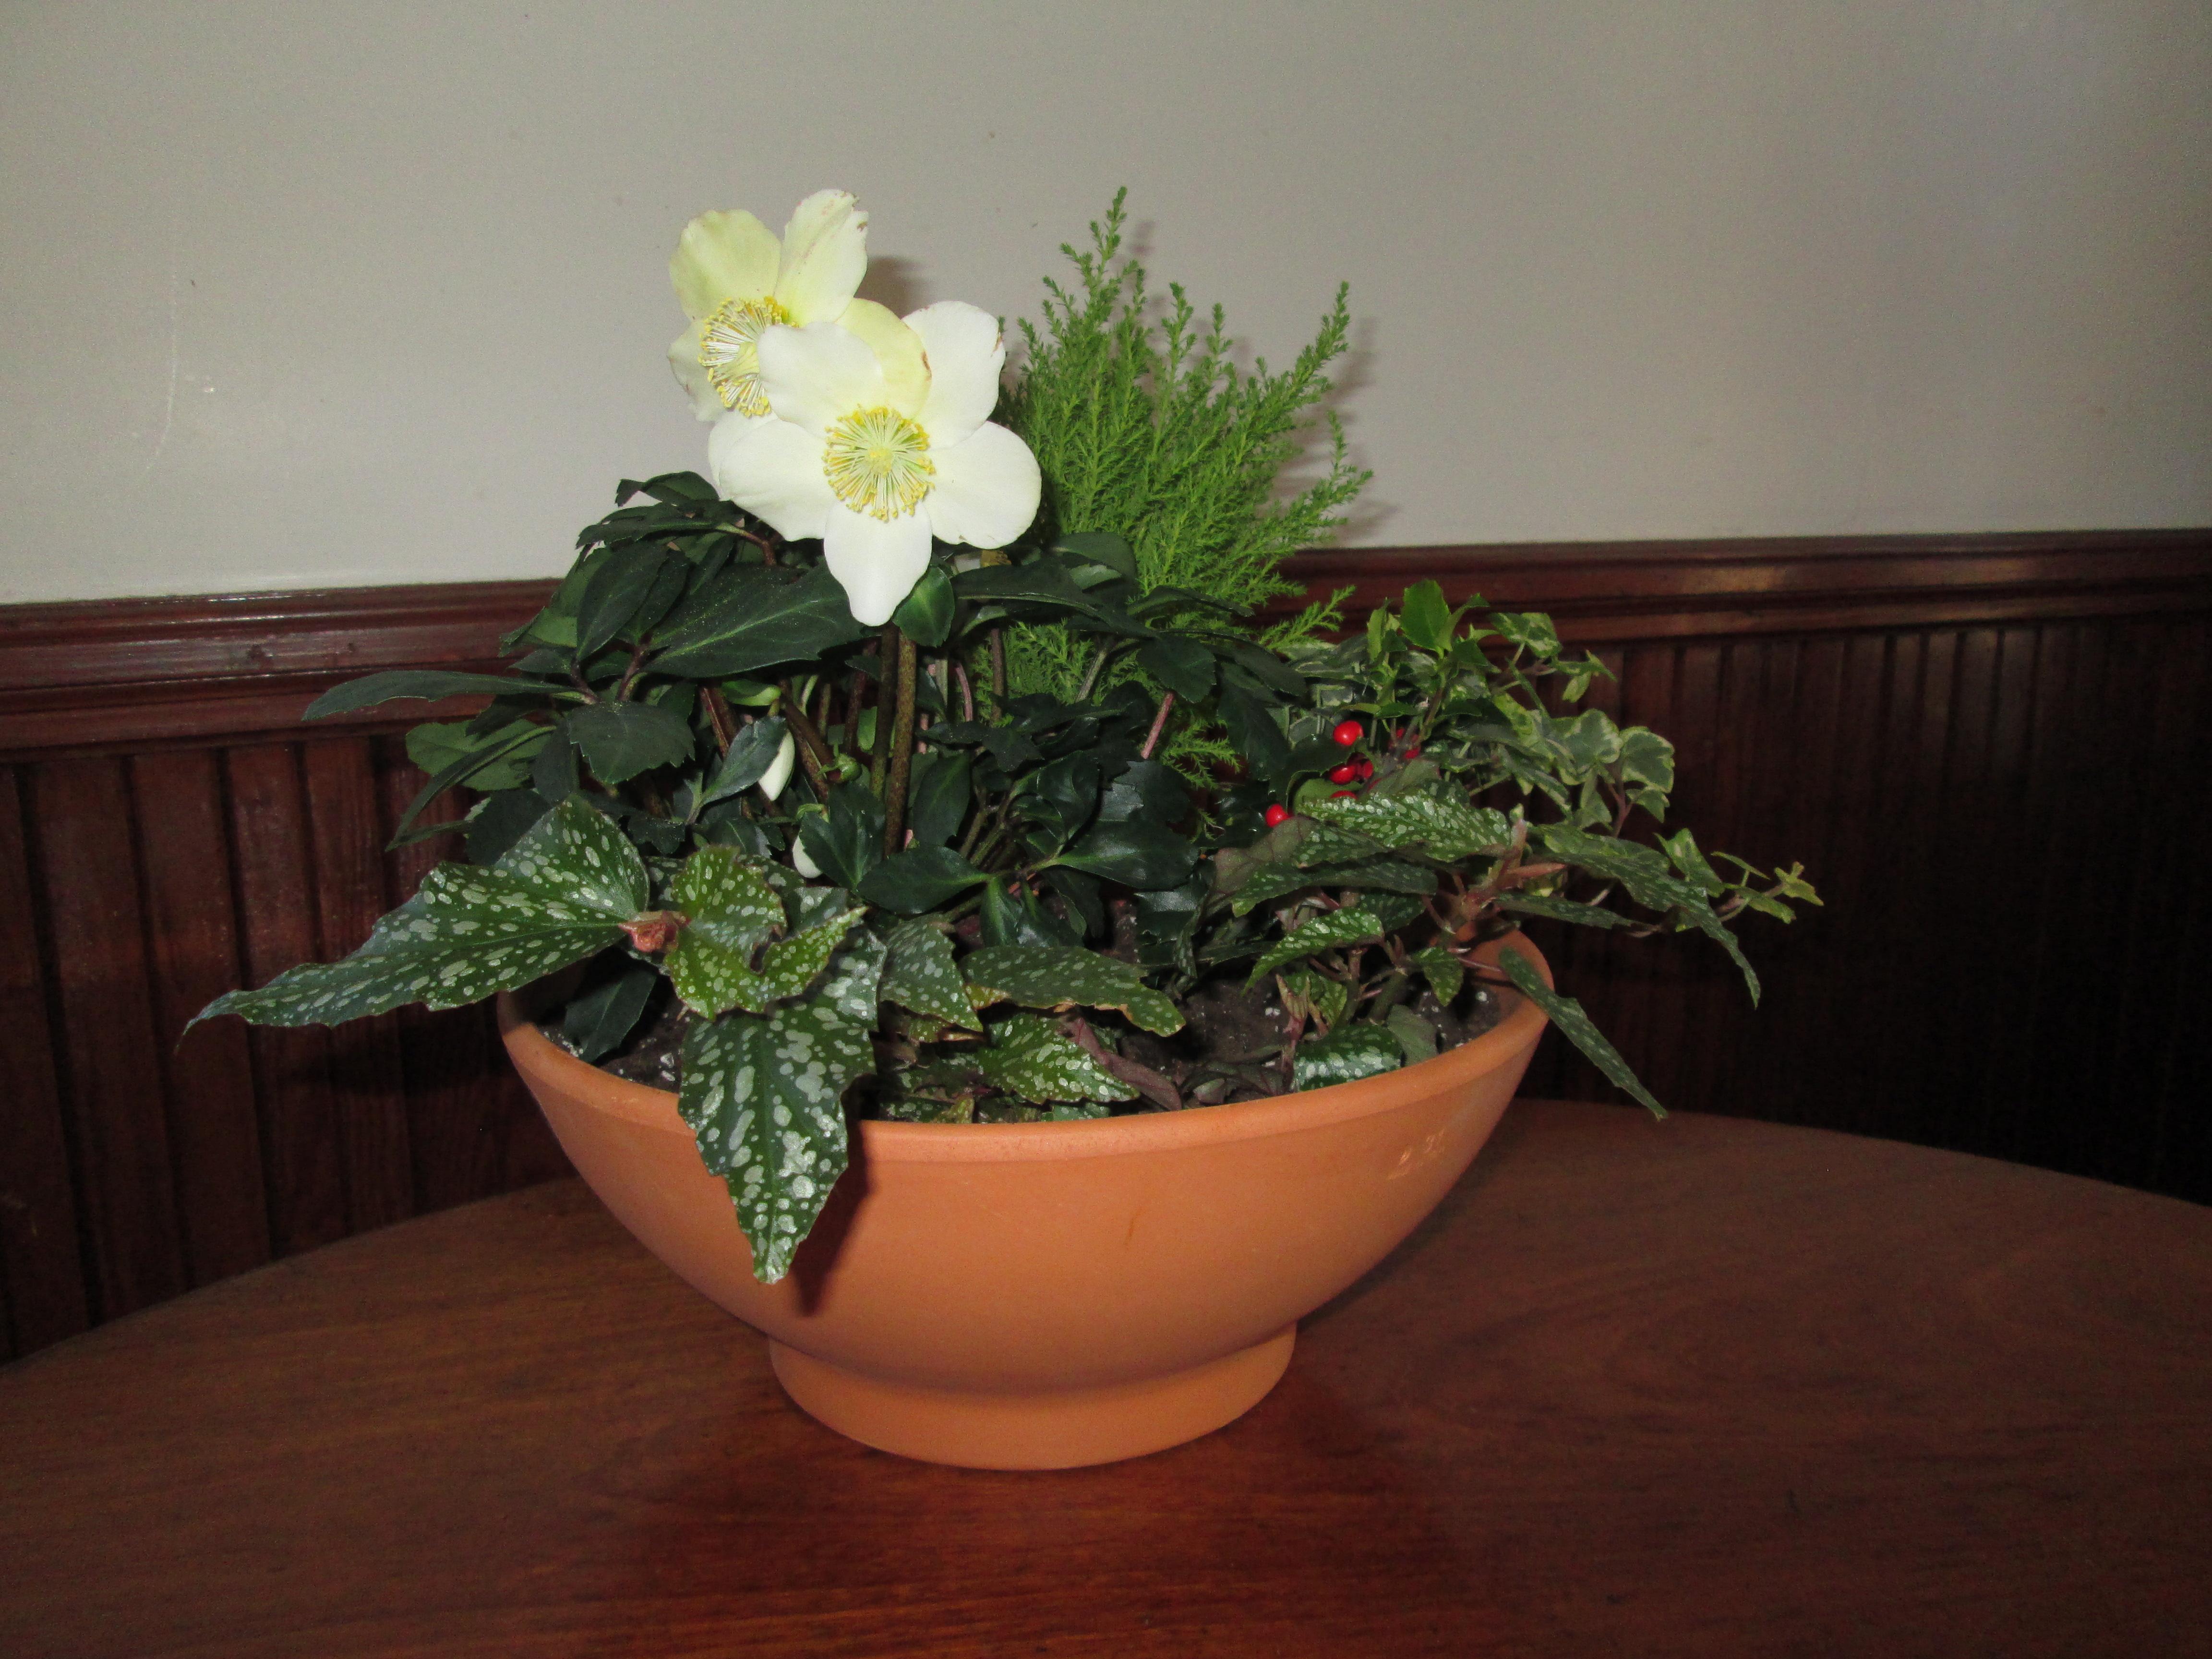 Winter plants terra cotta pot arrangement 12.14